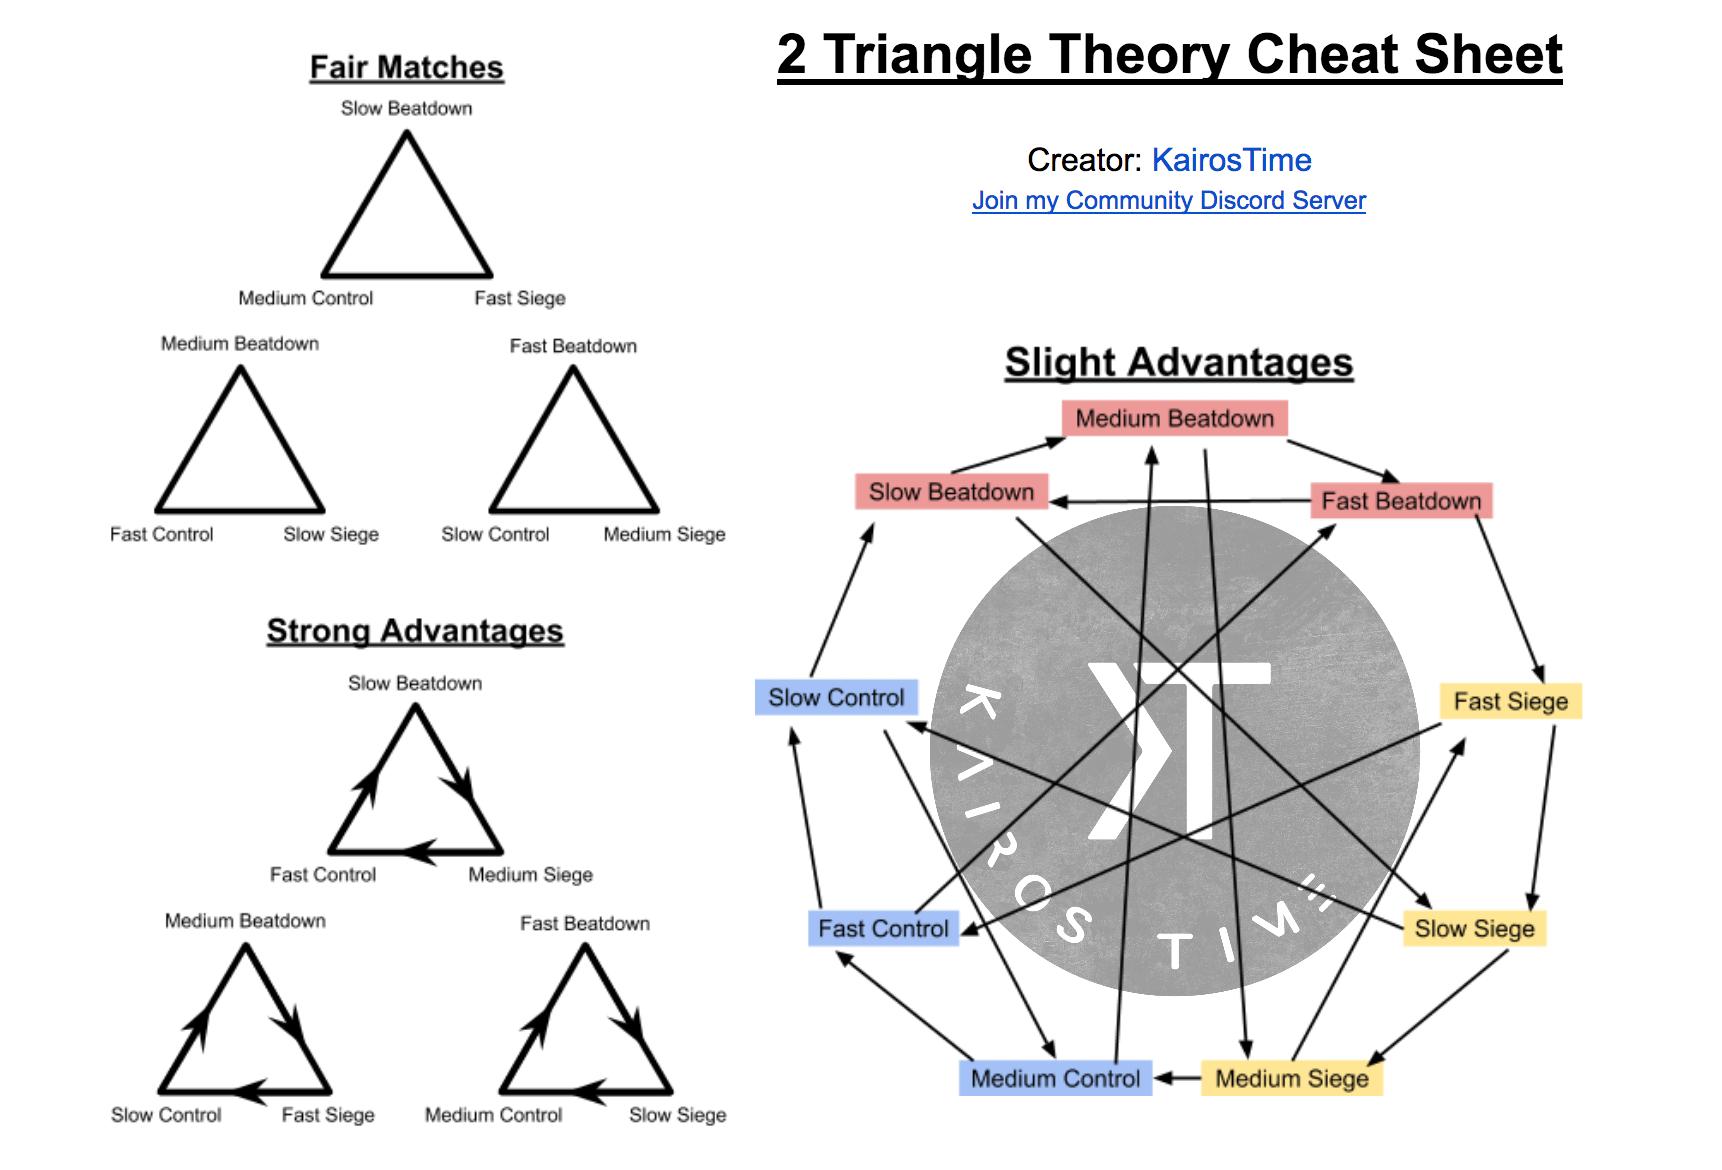 2 triangle theory